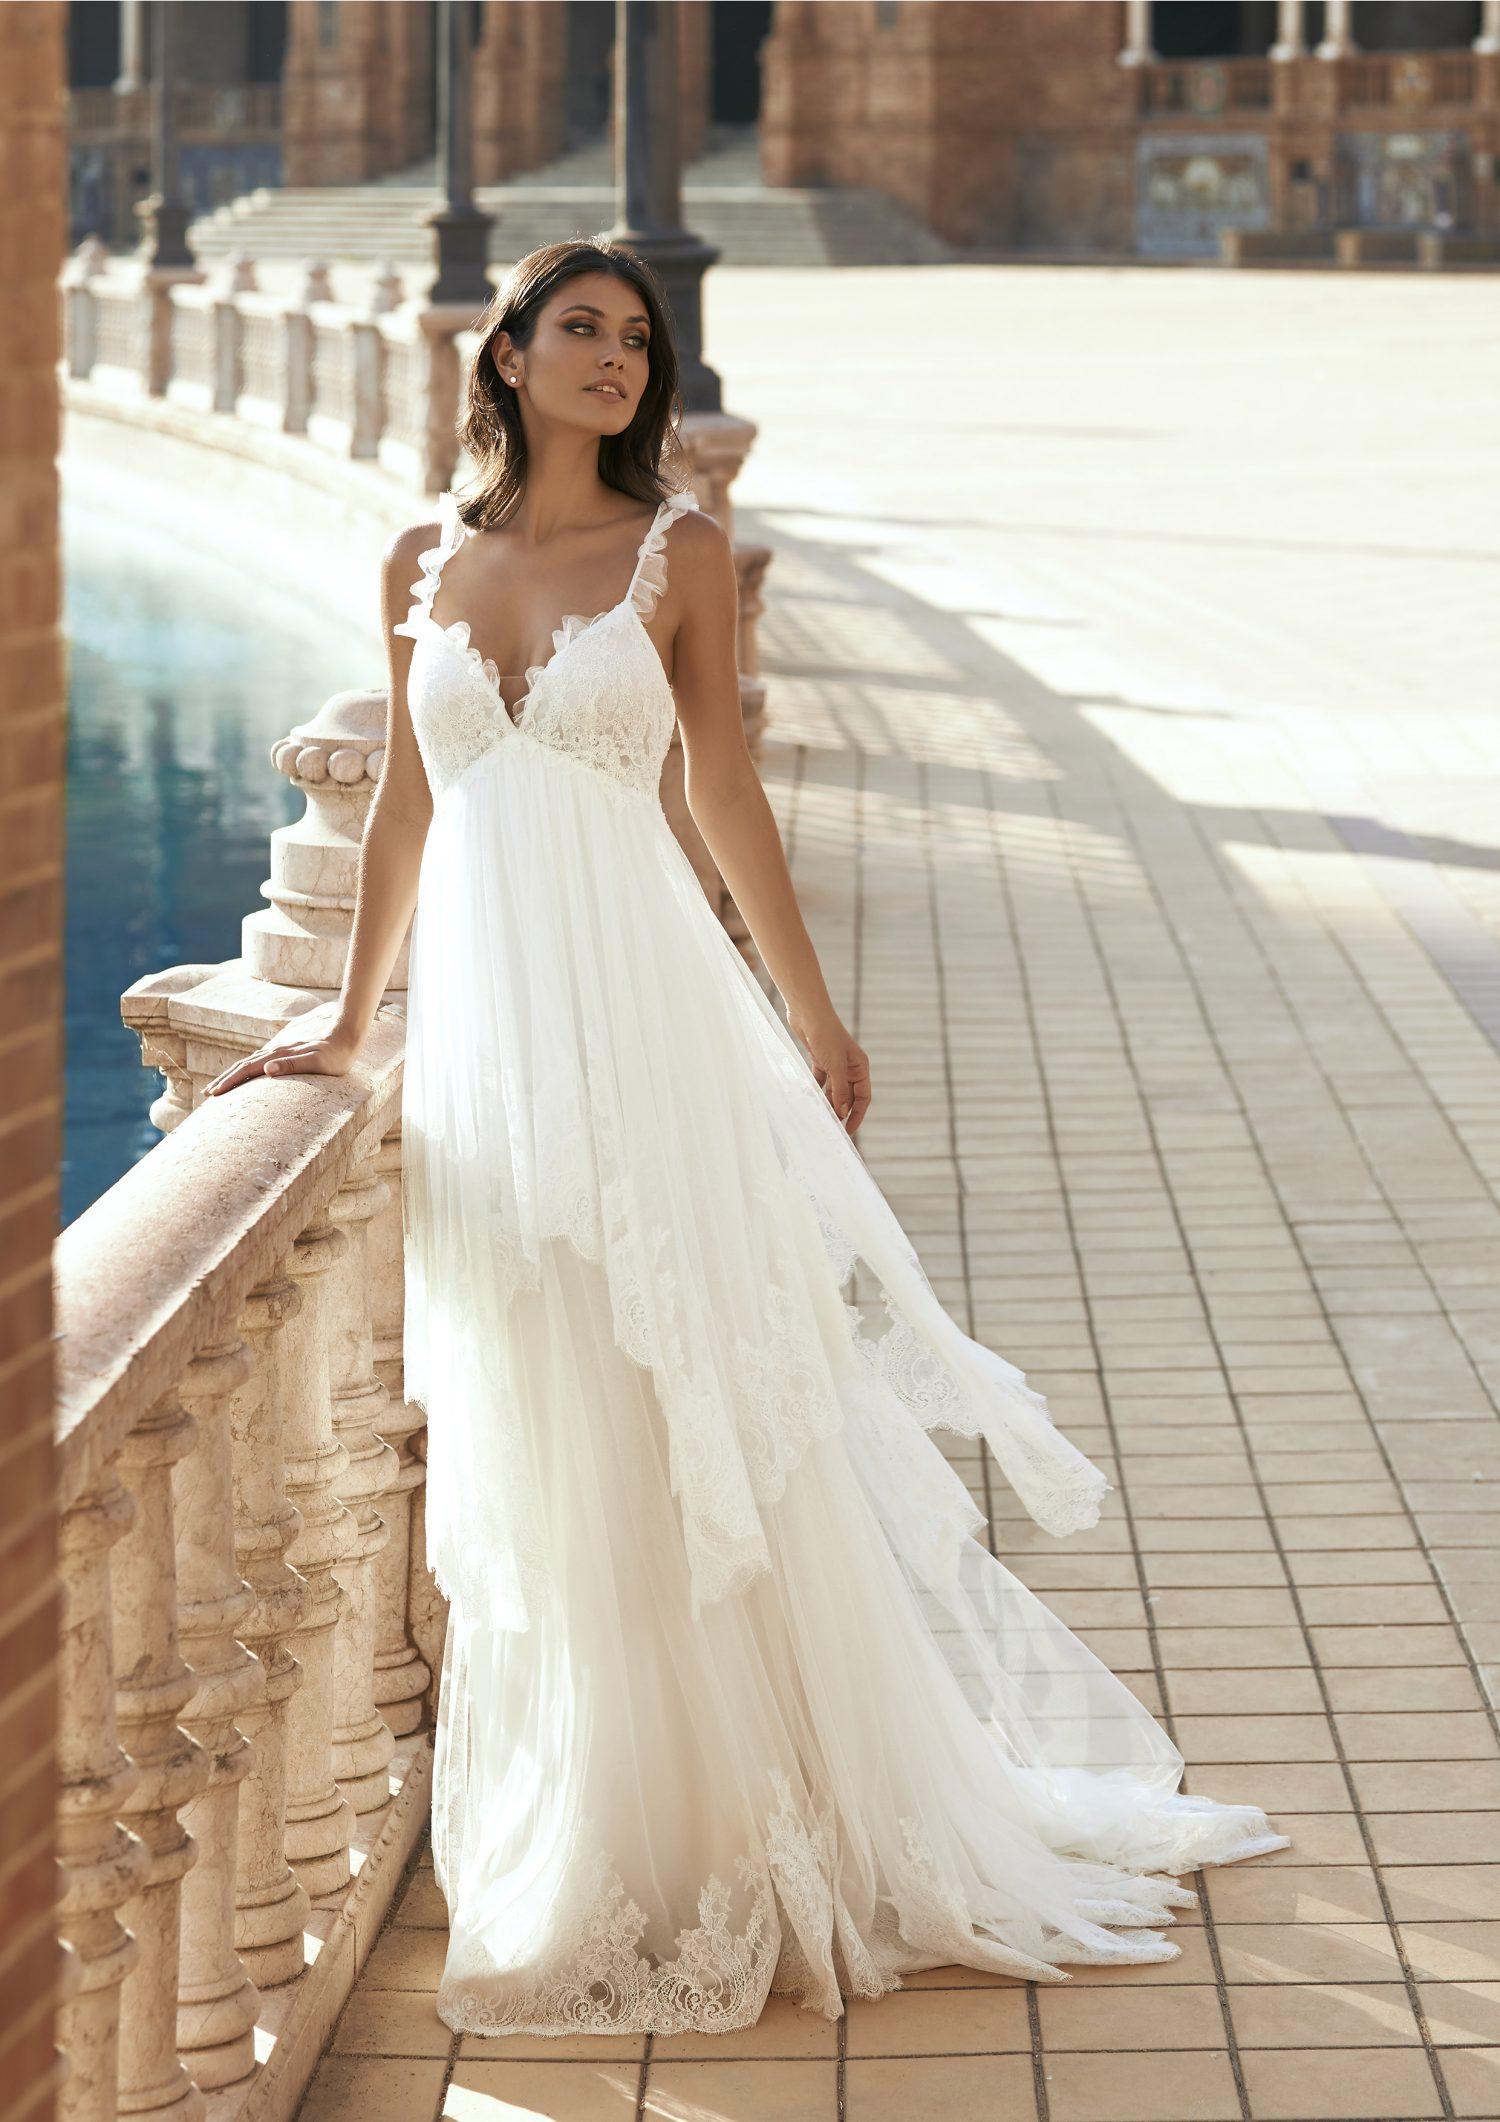 Pronovias vestidos de Novia 2021 Marchesa 20 - Marchesa la Nueva Colección de Vestidos de Novia Pronovias 2021